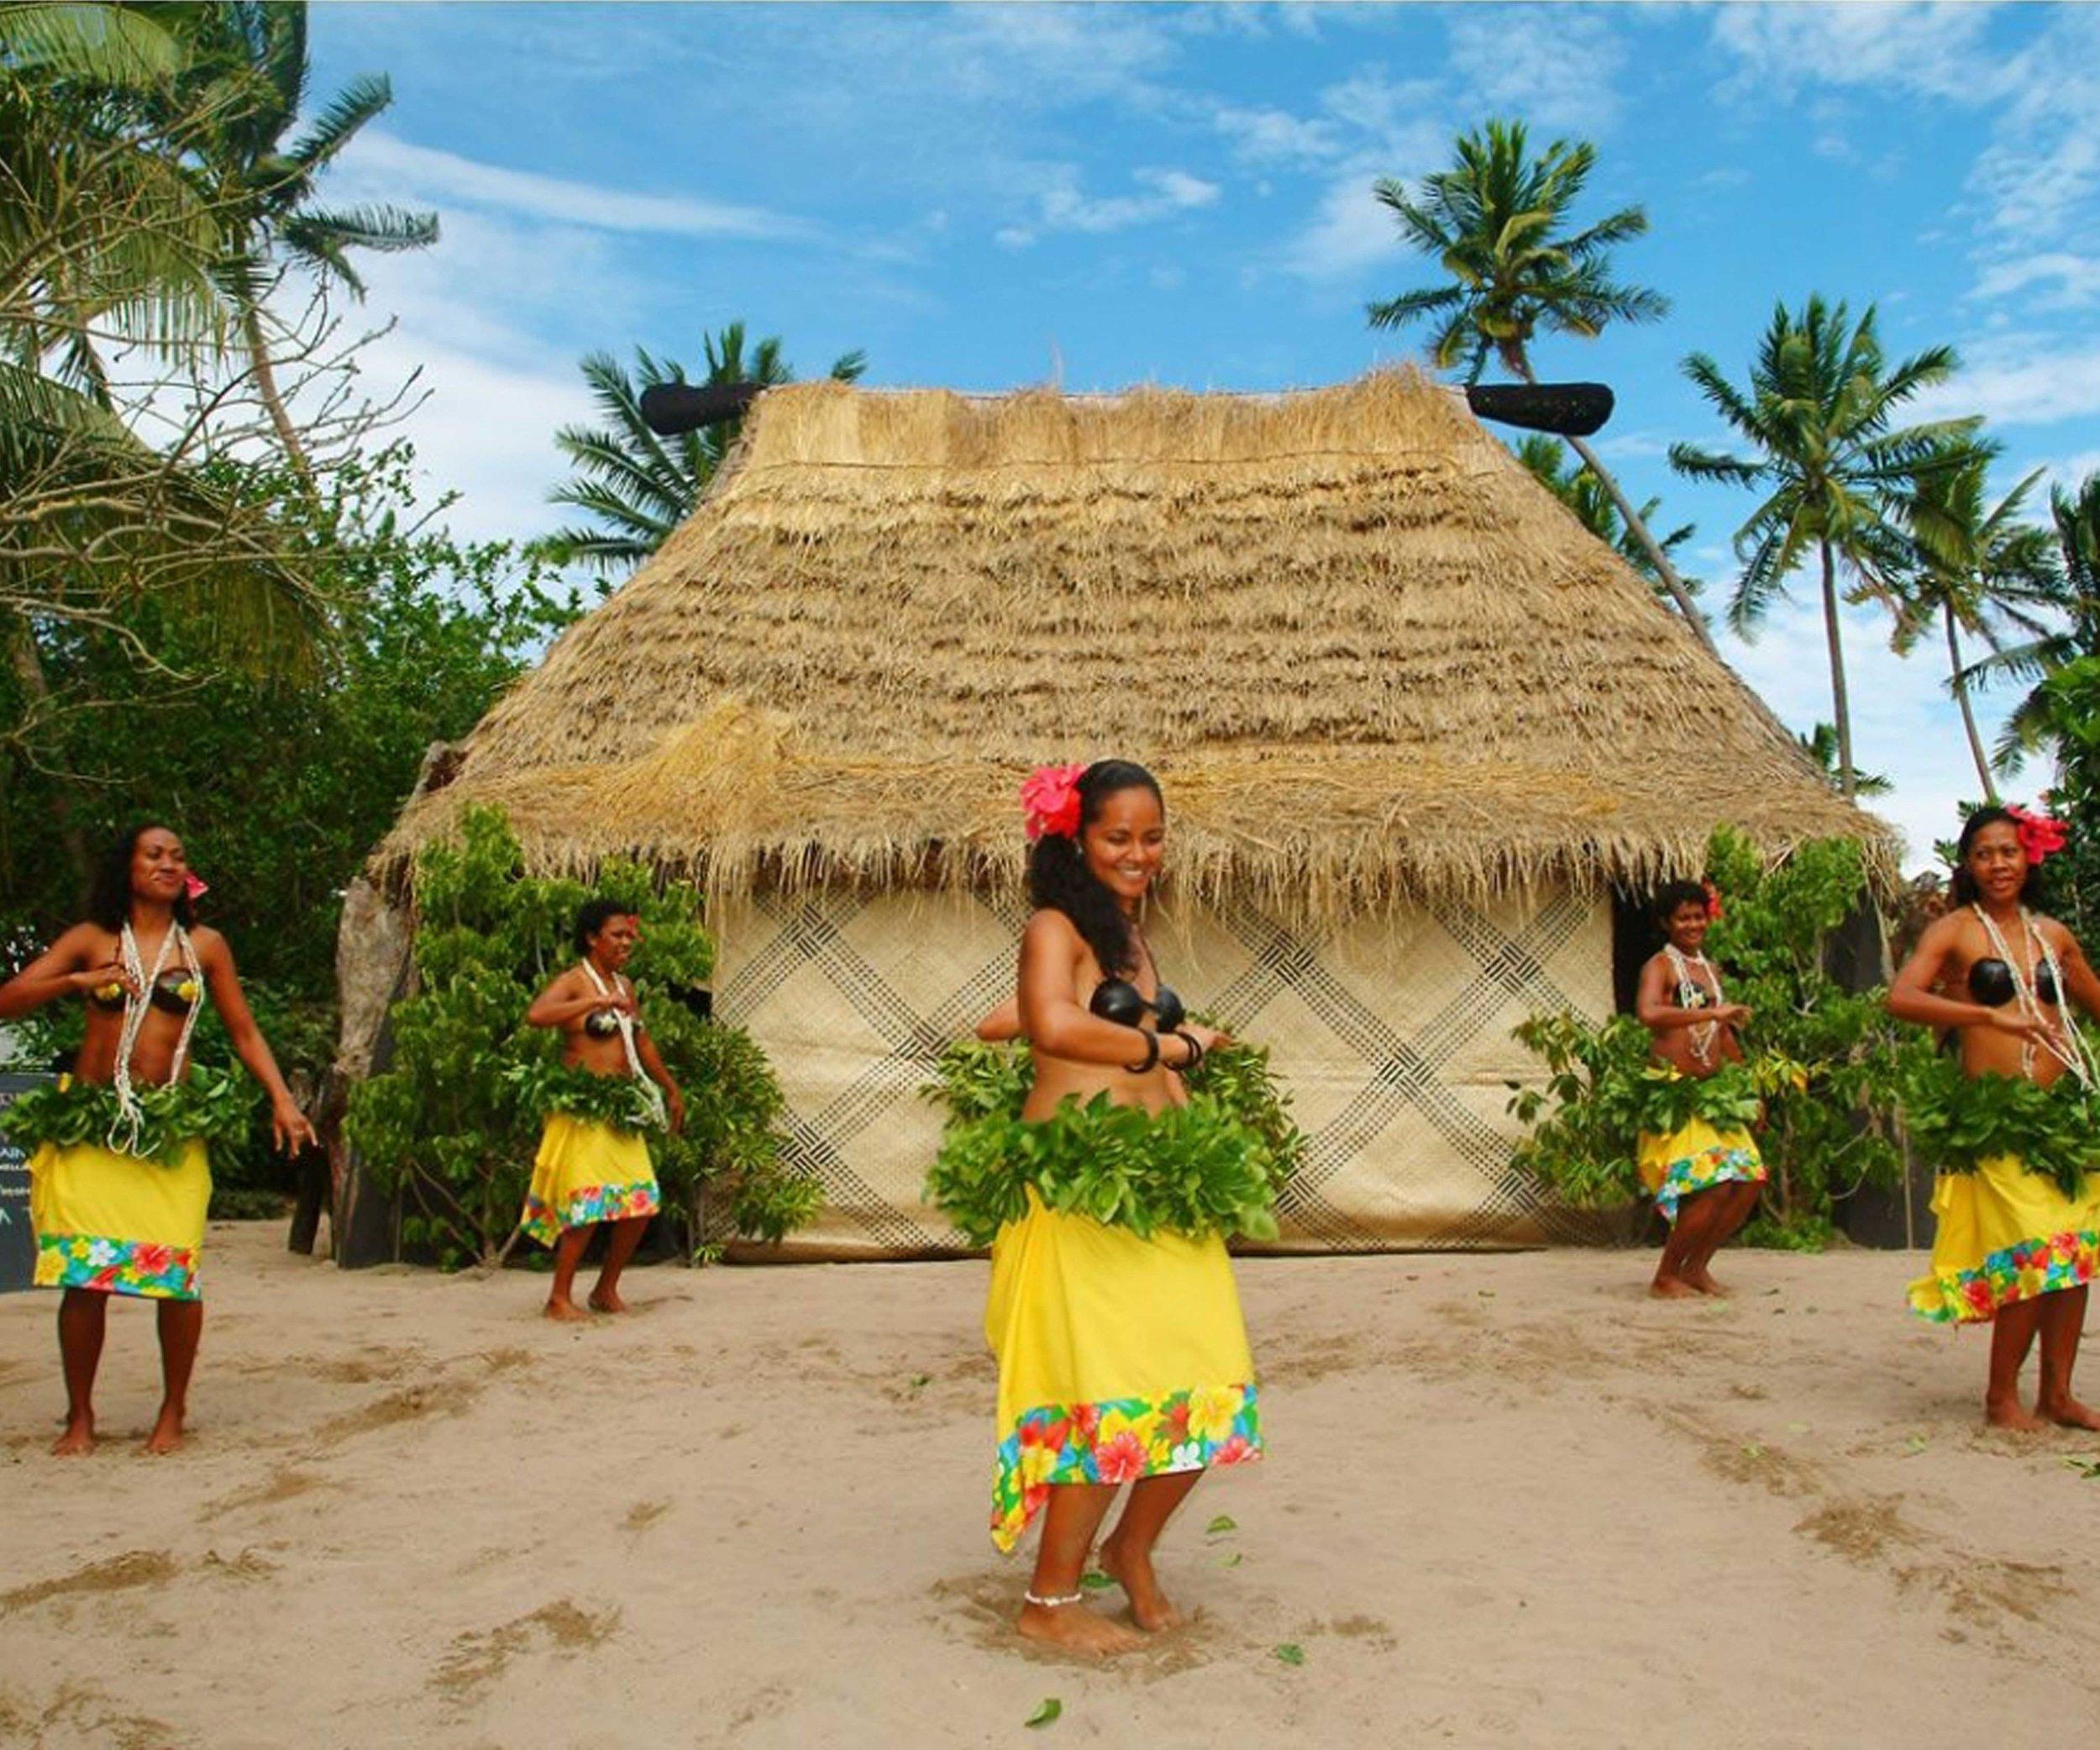 Palestra-40kalcatrazes-Fiji-a.jpg